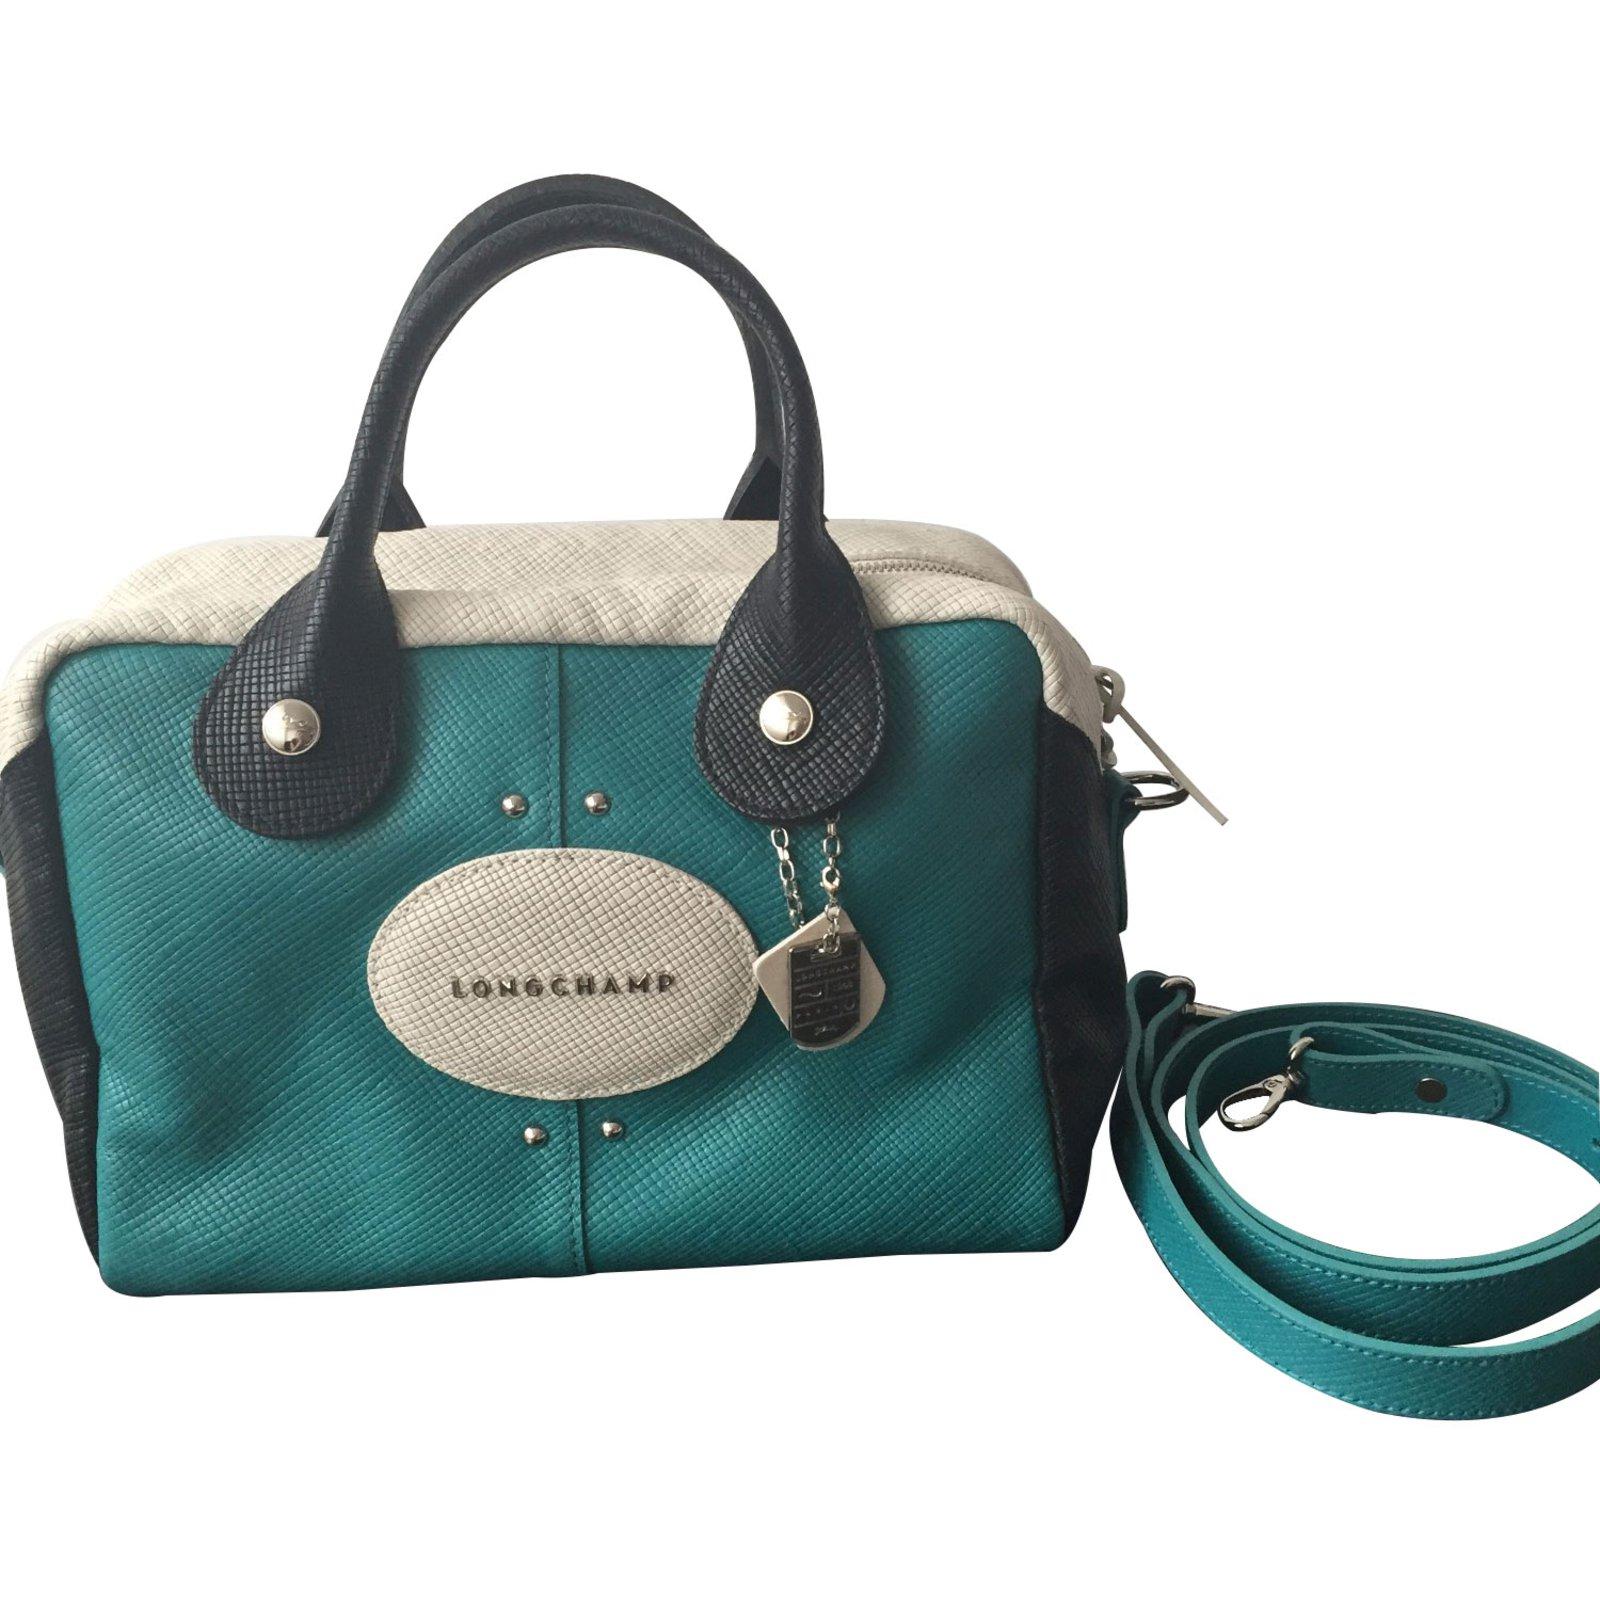 Longchamp Cuir Bleu